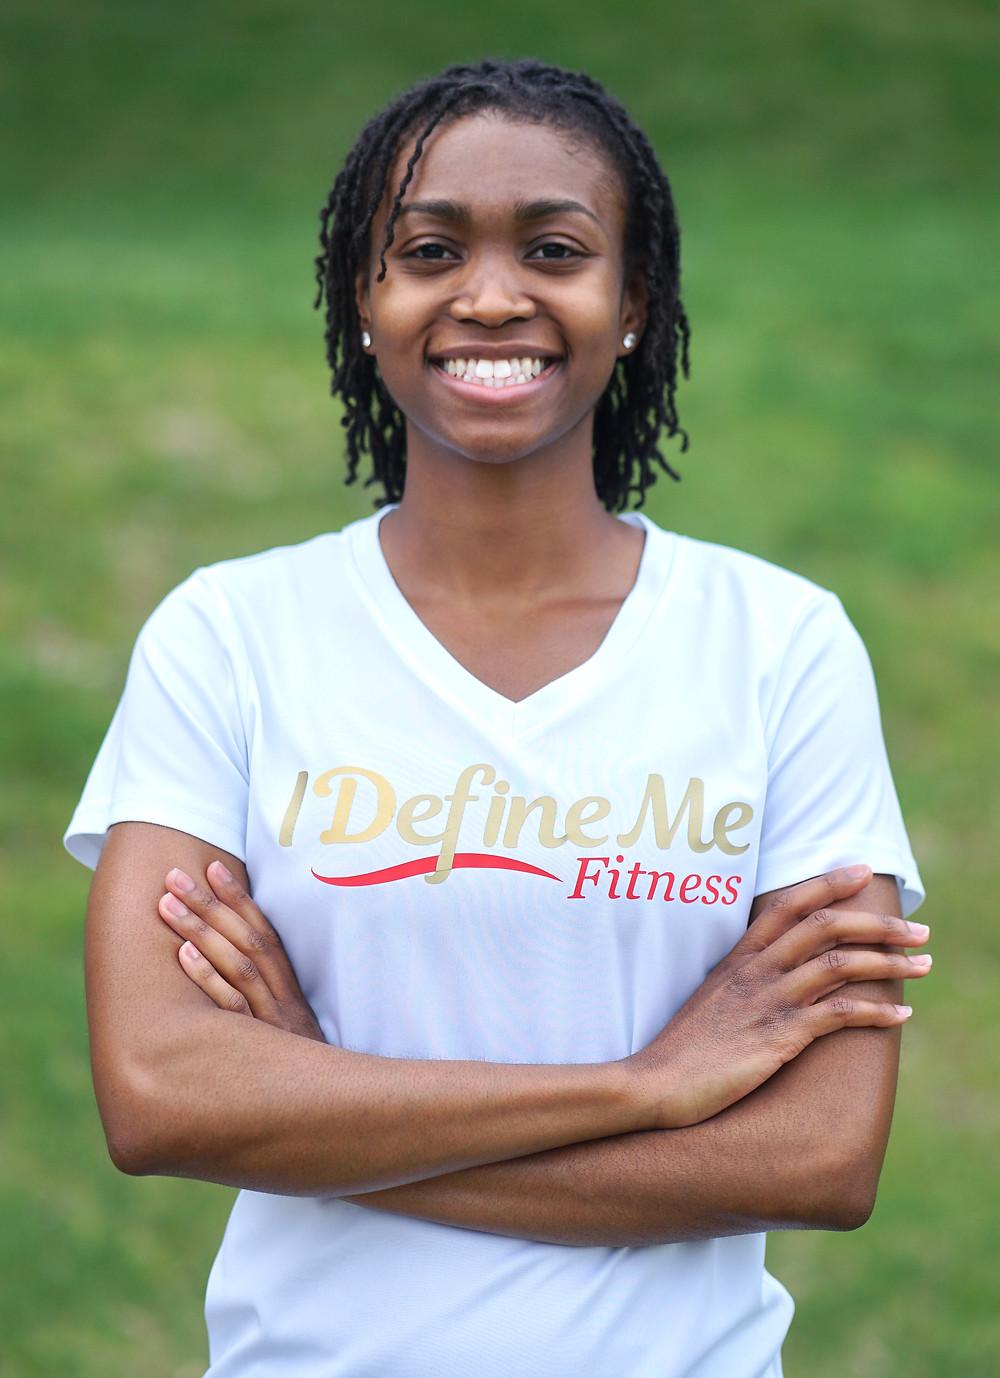 Photo Courtesy of Demetria Stewart | I Define Me Fitness, LLC